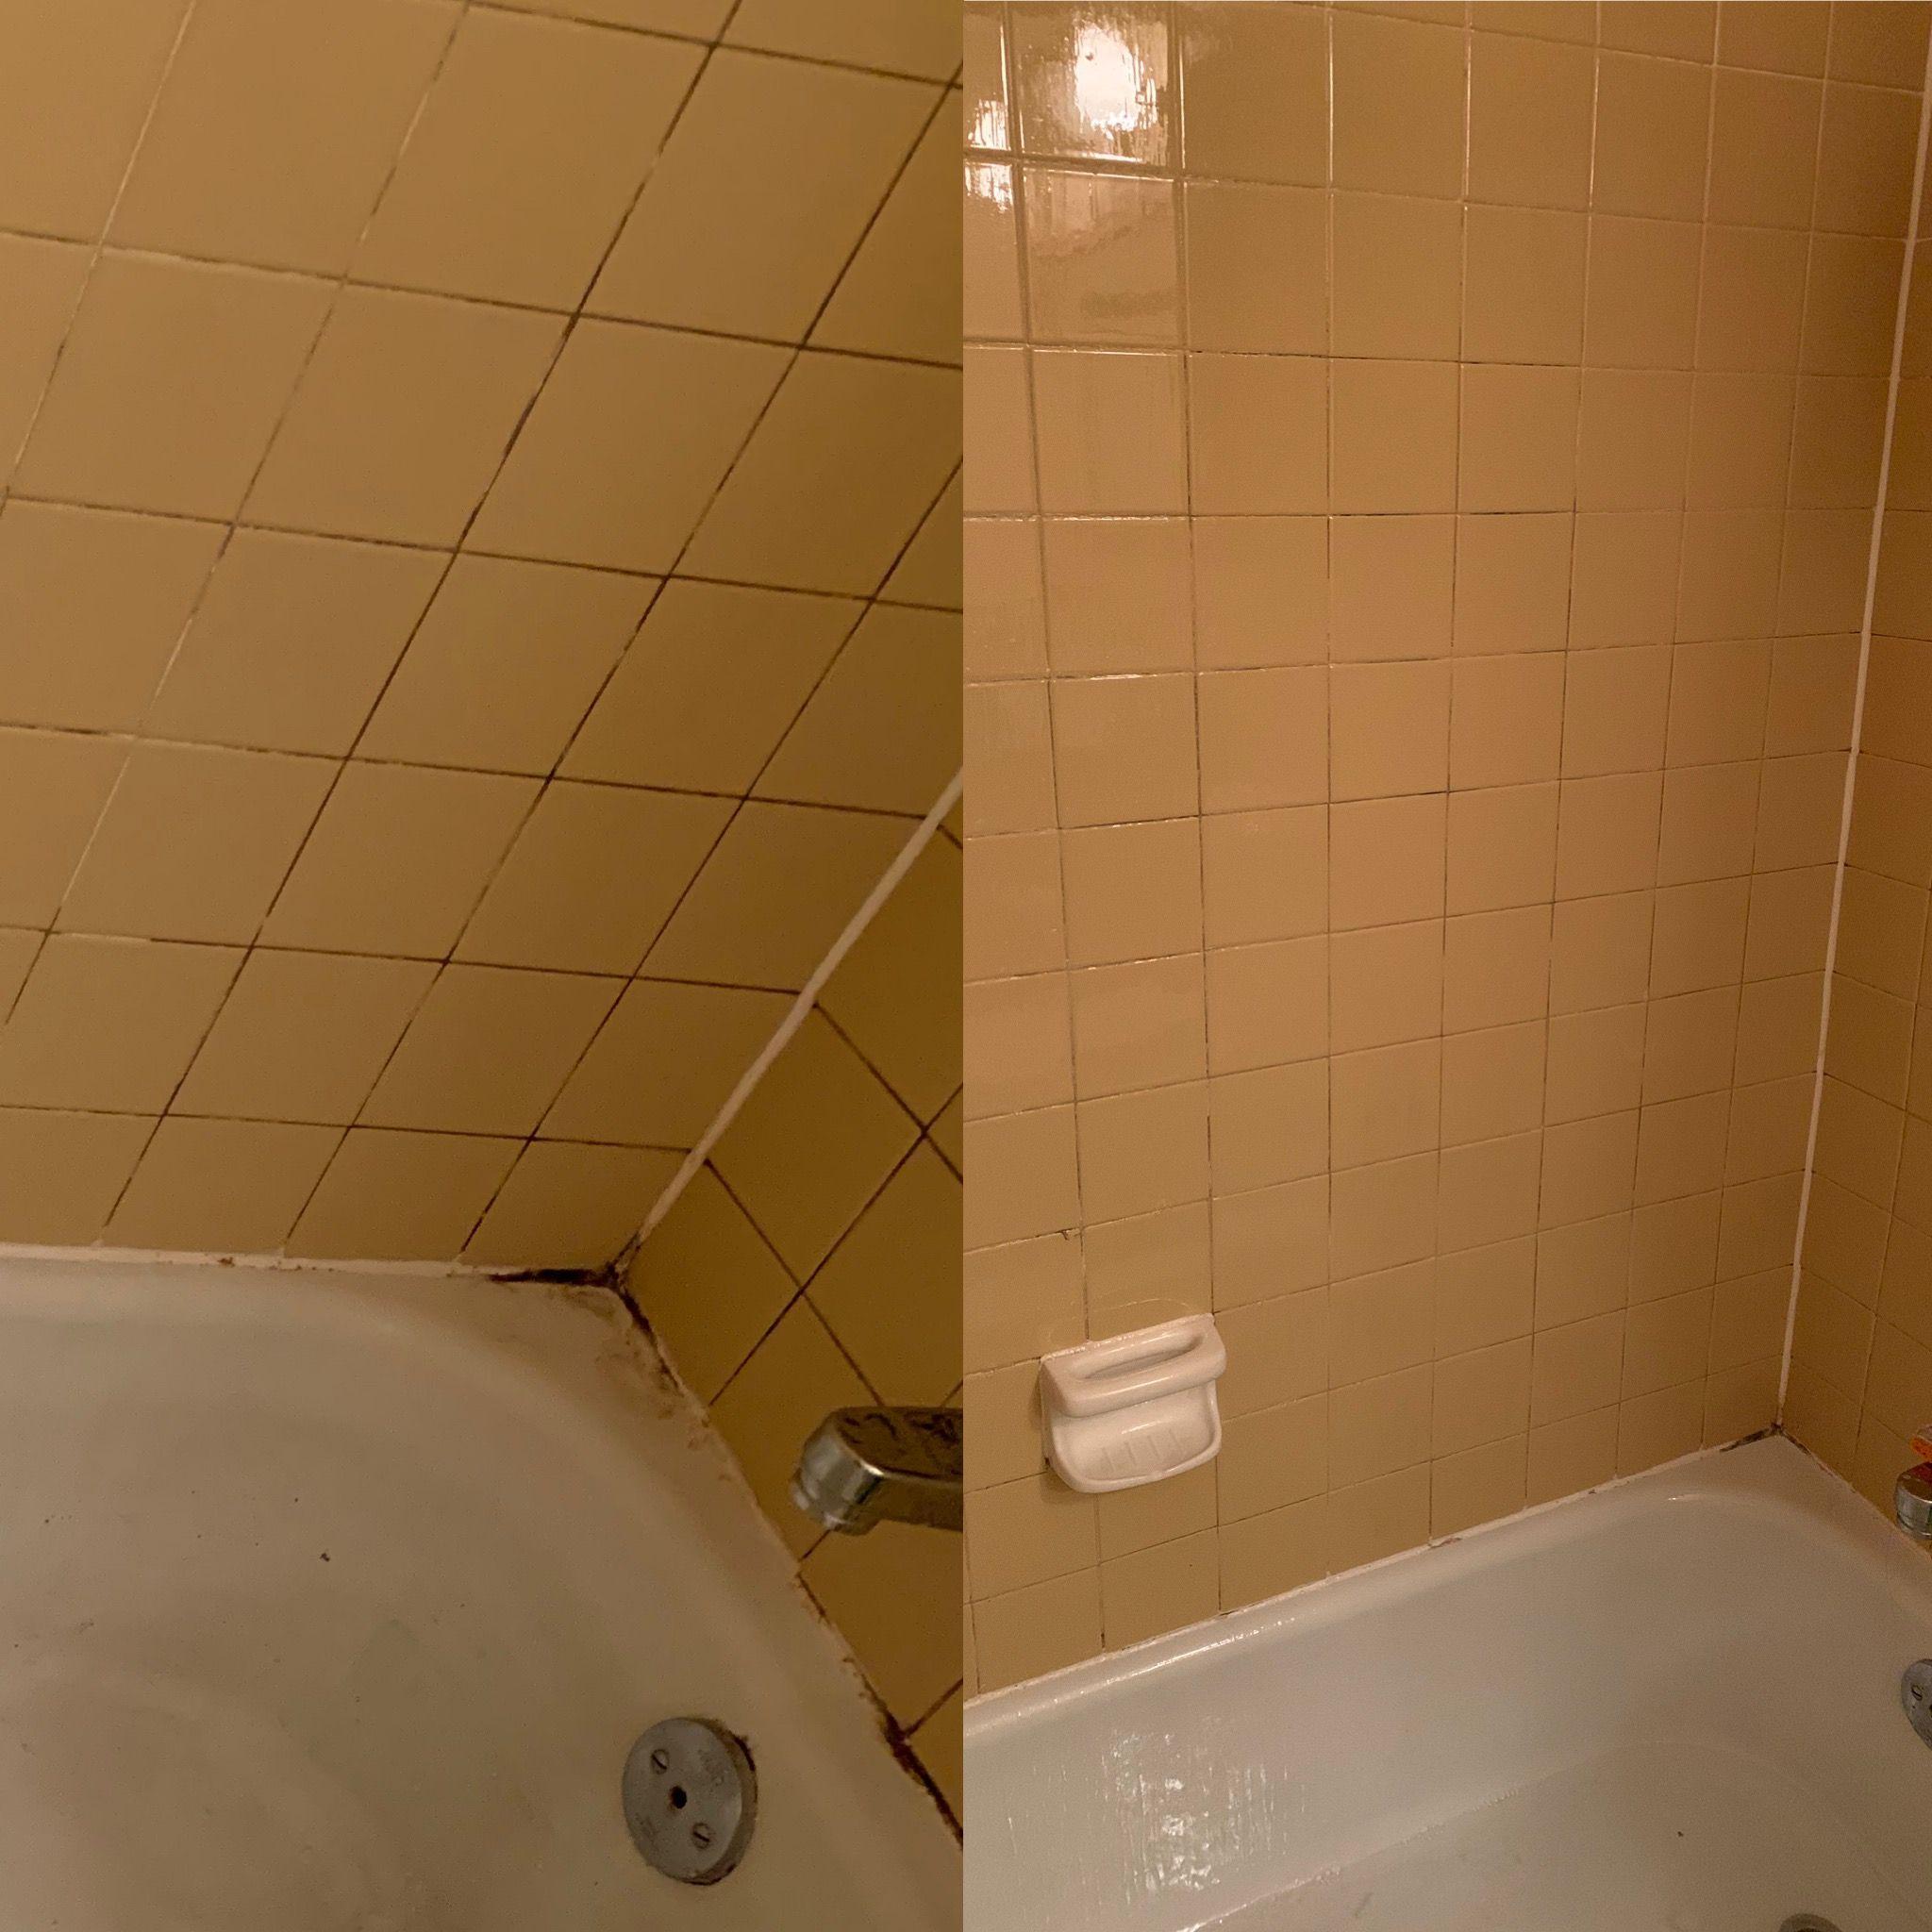 Cleaning the tub bakingsoda vinegar bathroom